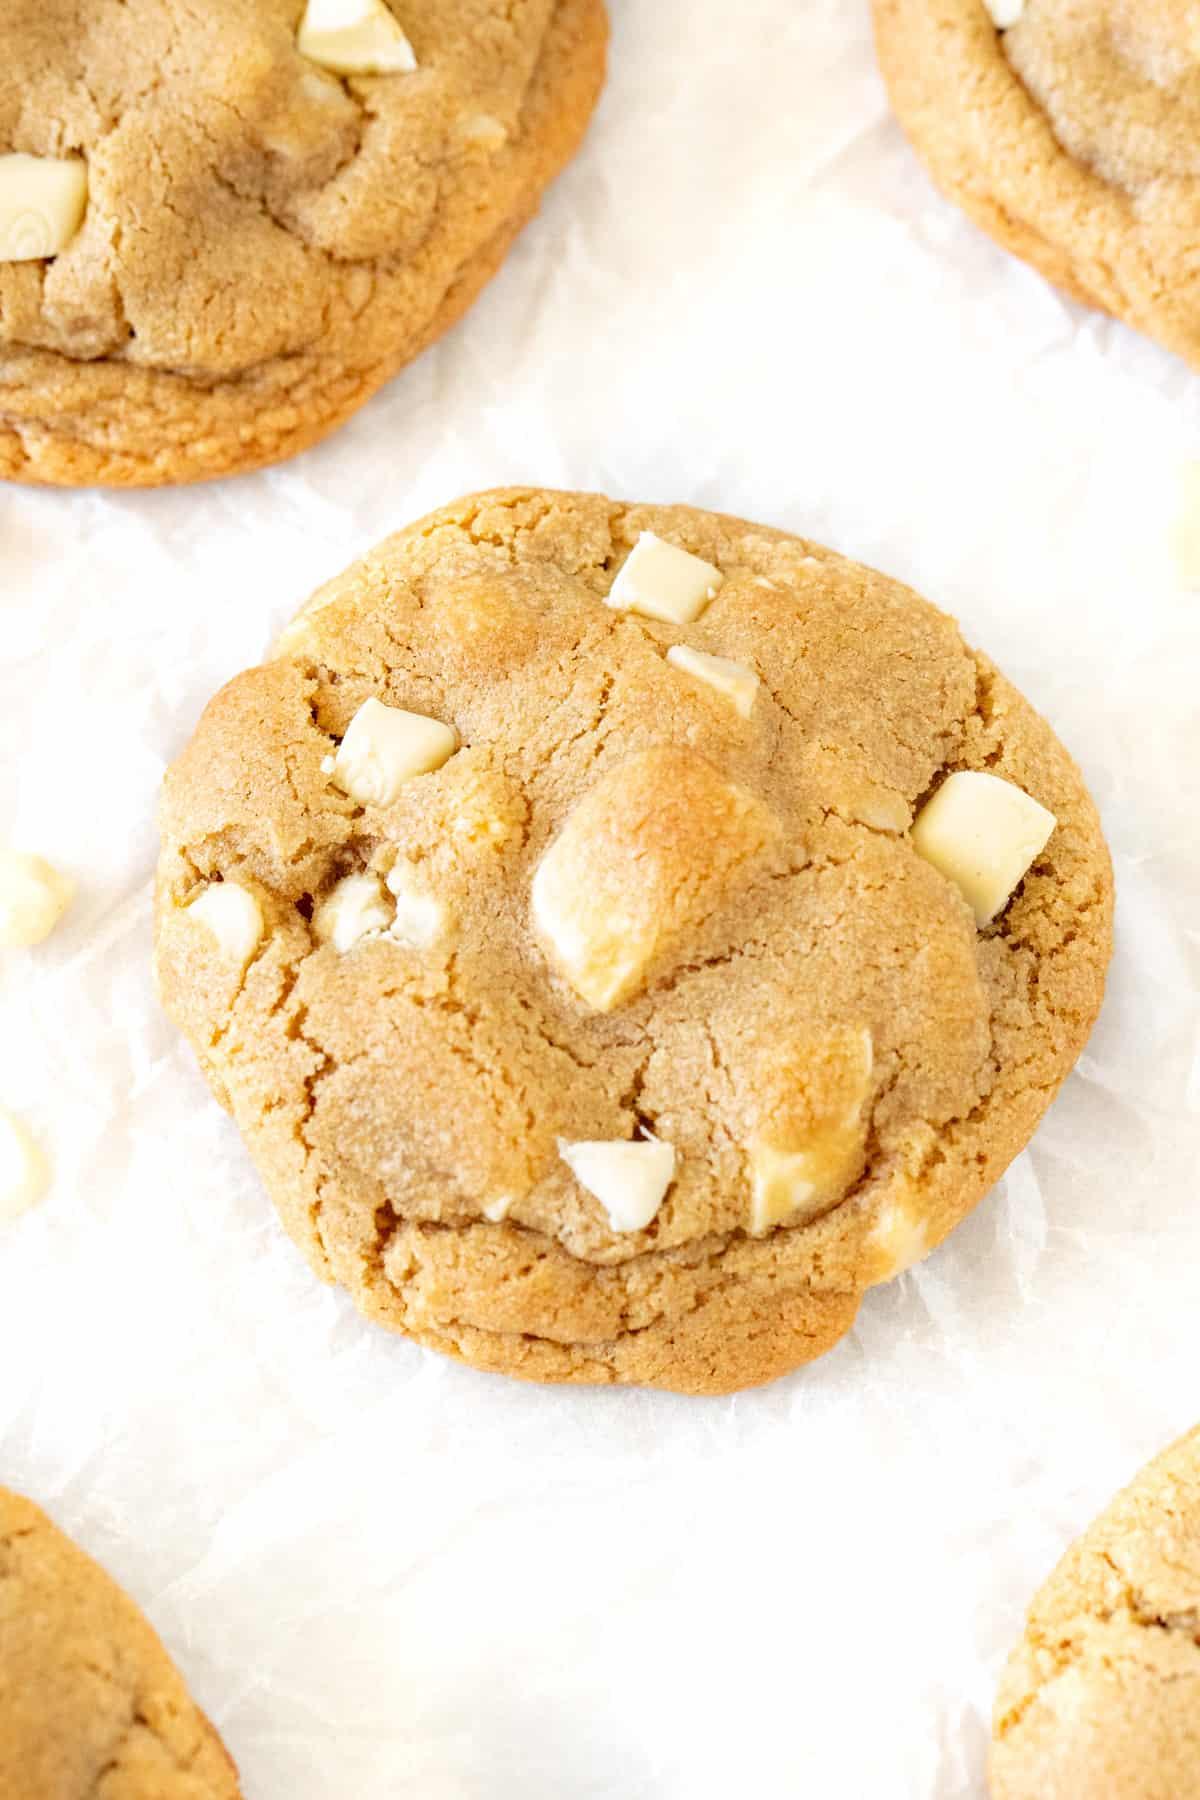 White chocolate chunk macadamia cookies on baking paper